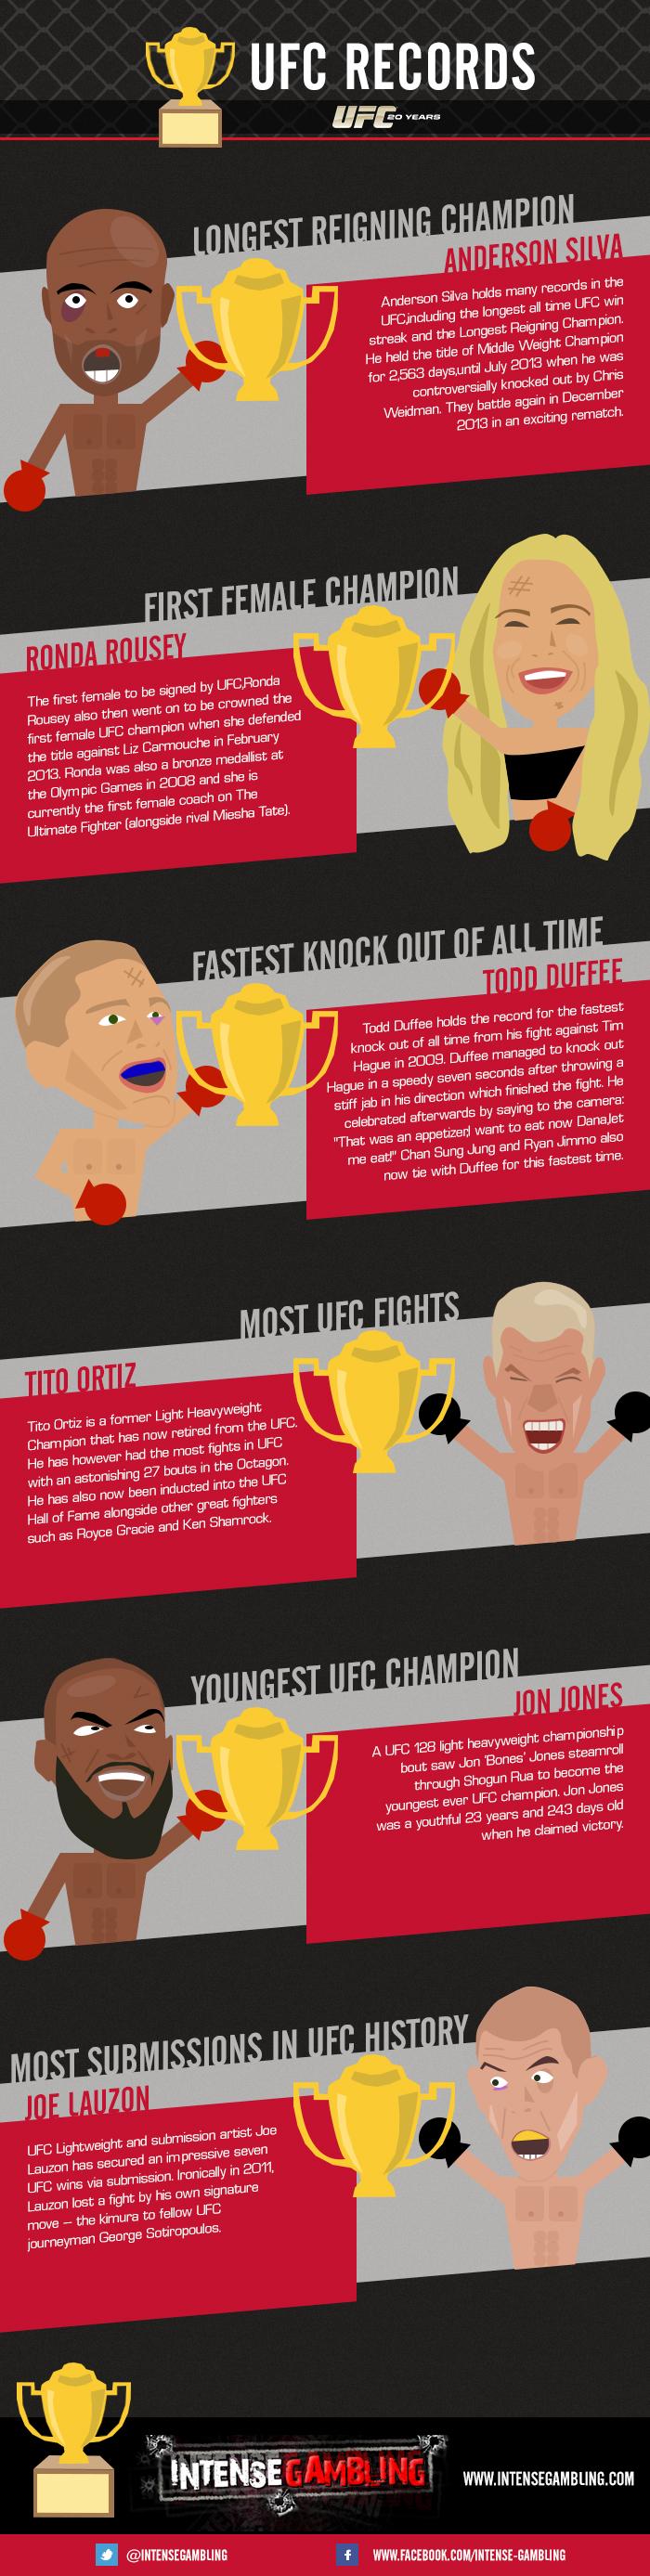 UFC records